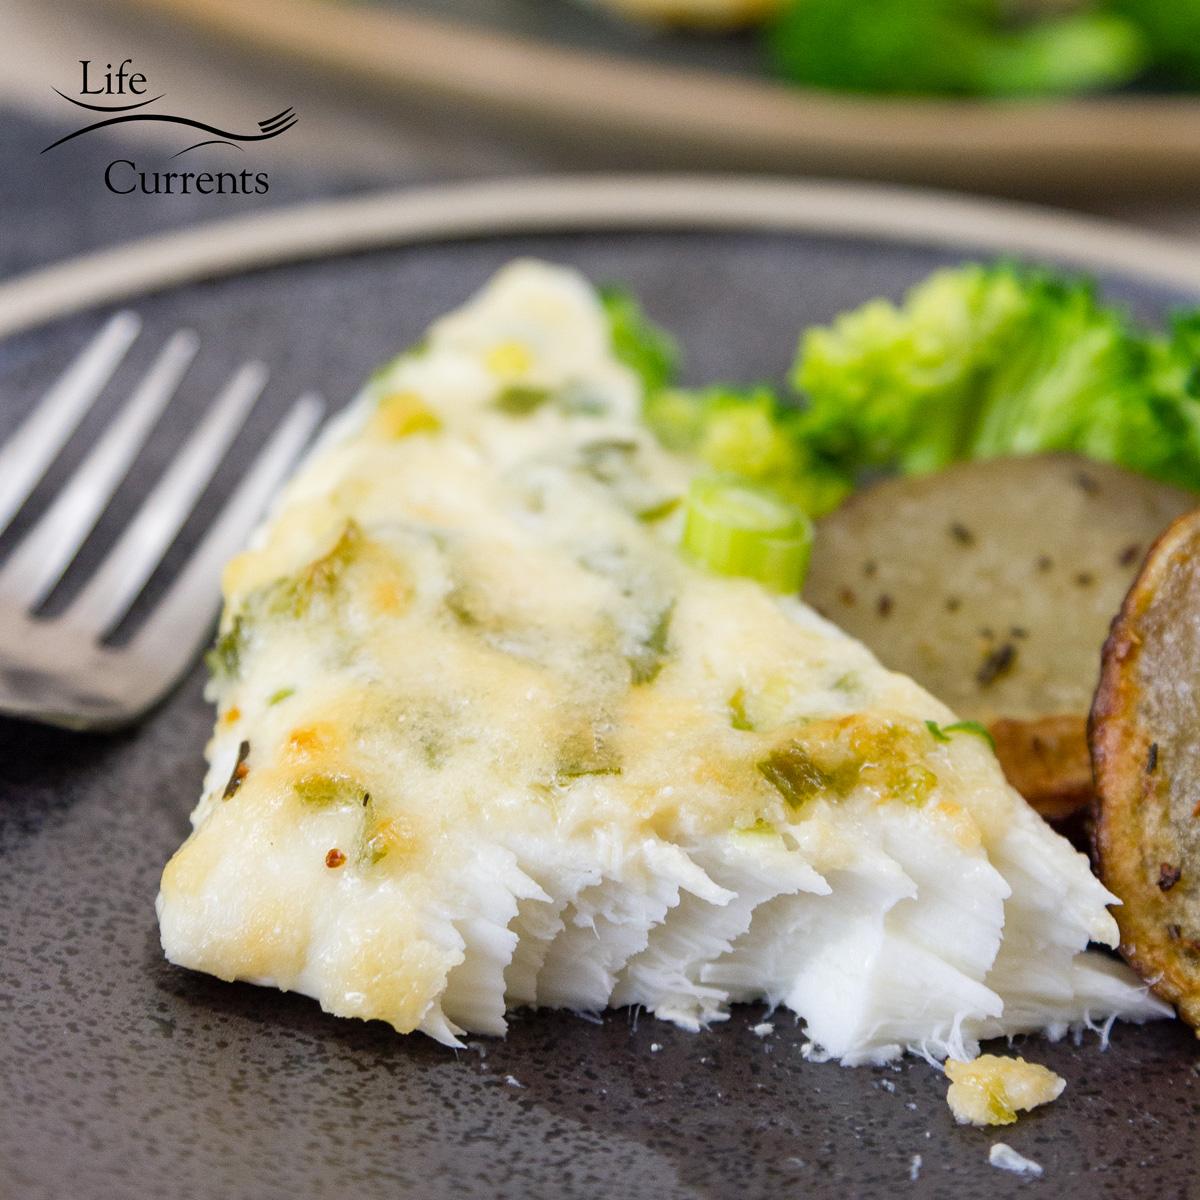 Parmesan Baked Halibut Recipe - Life Currents